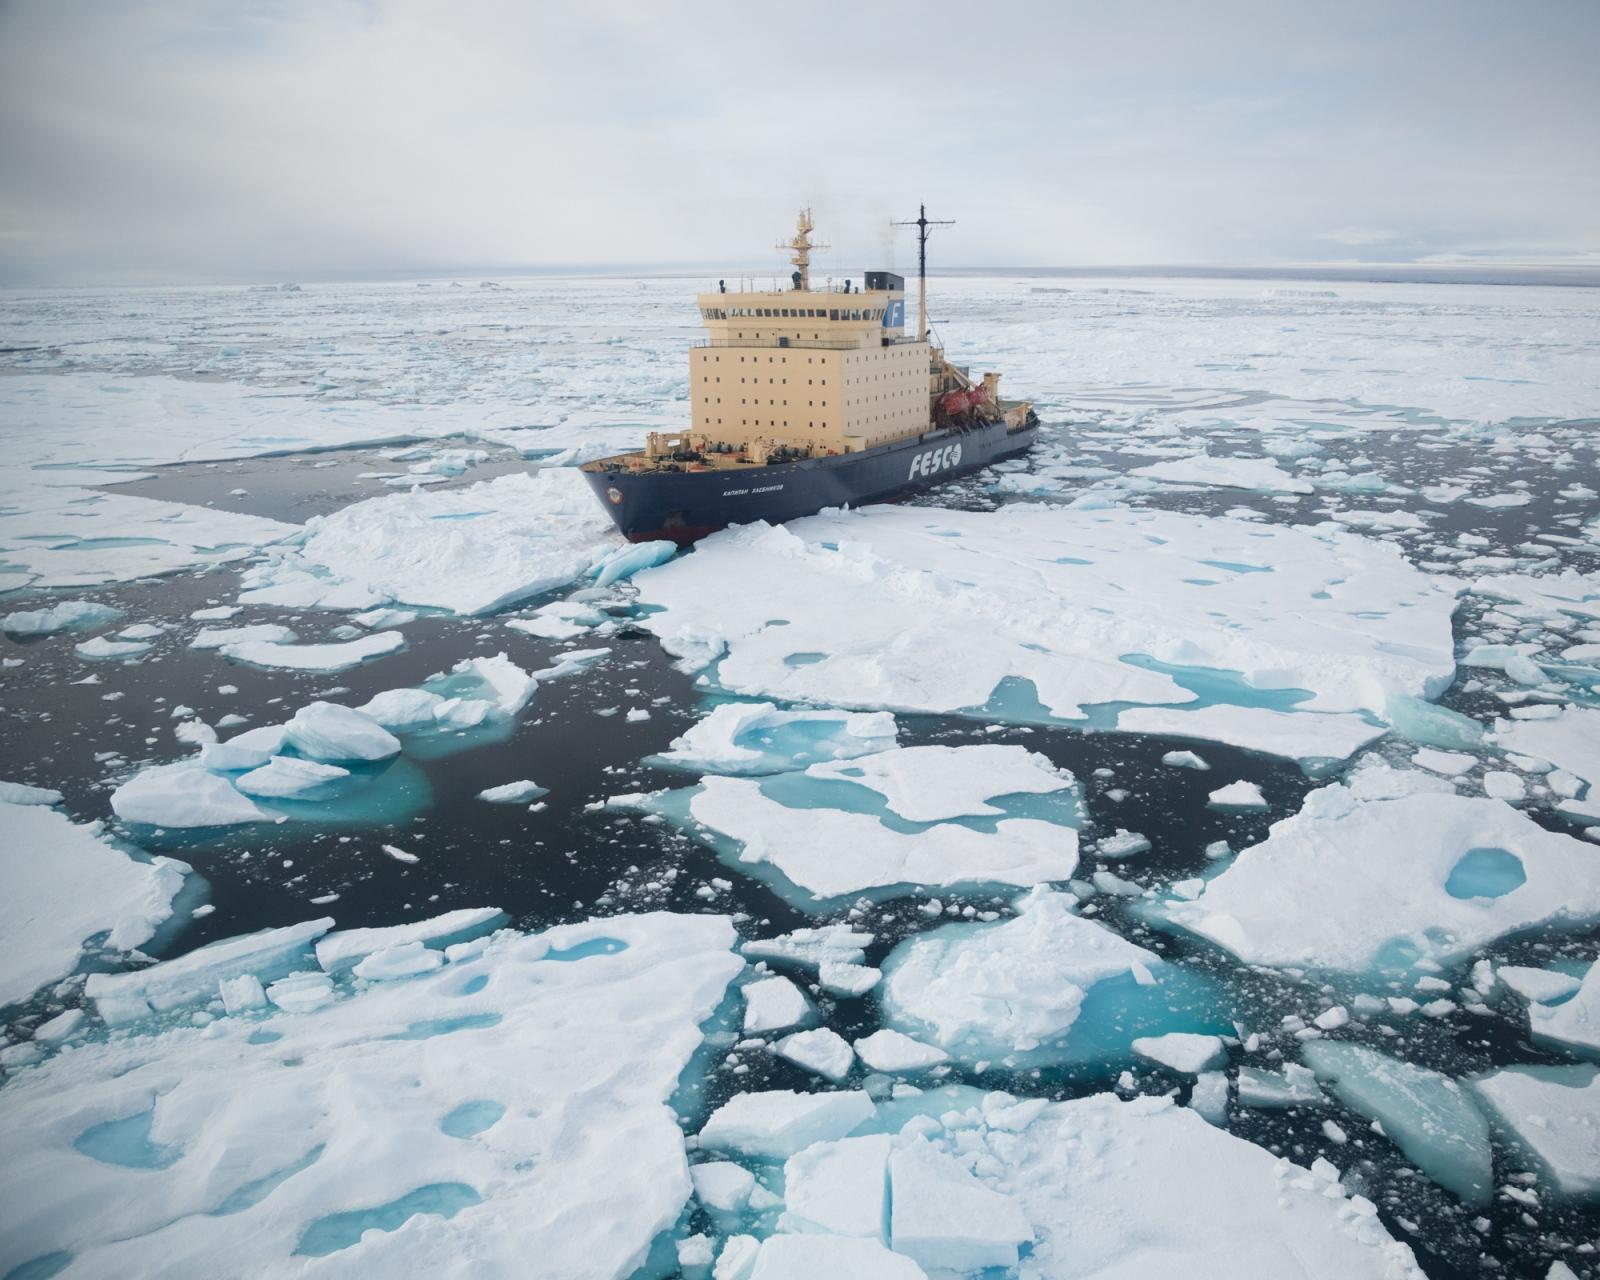 The Russian icebreaker Kapitan Khlebnikov, in the sea ice off northeast Greenland, 2016.